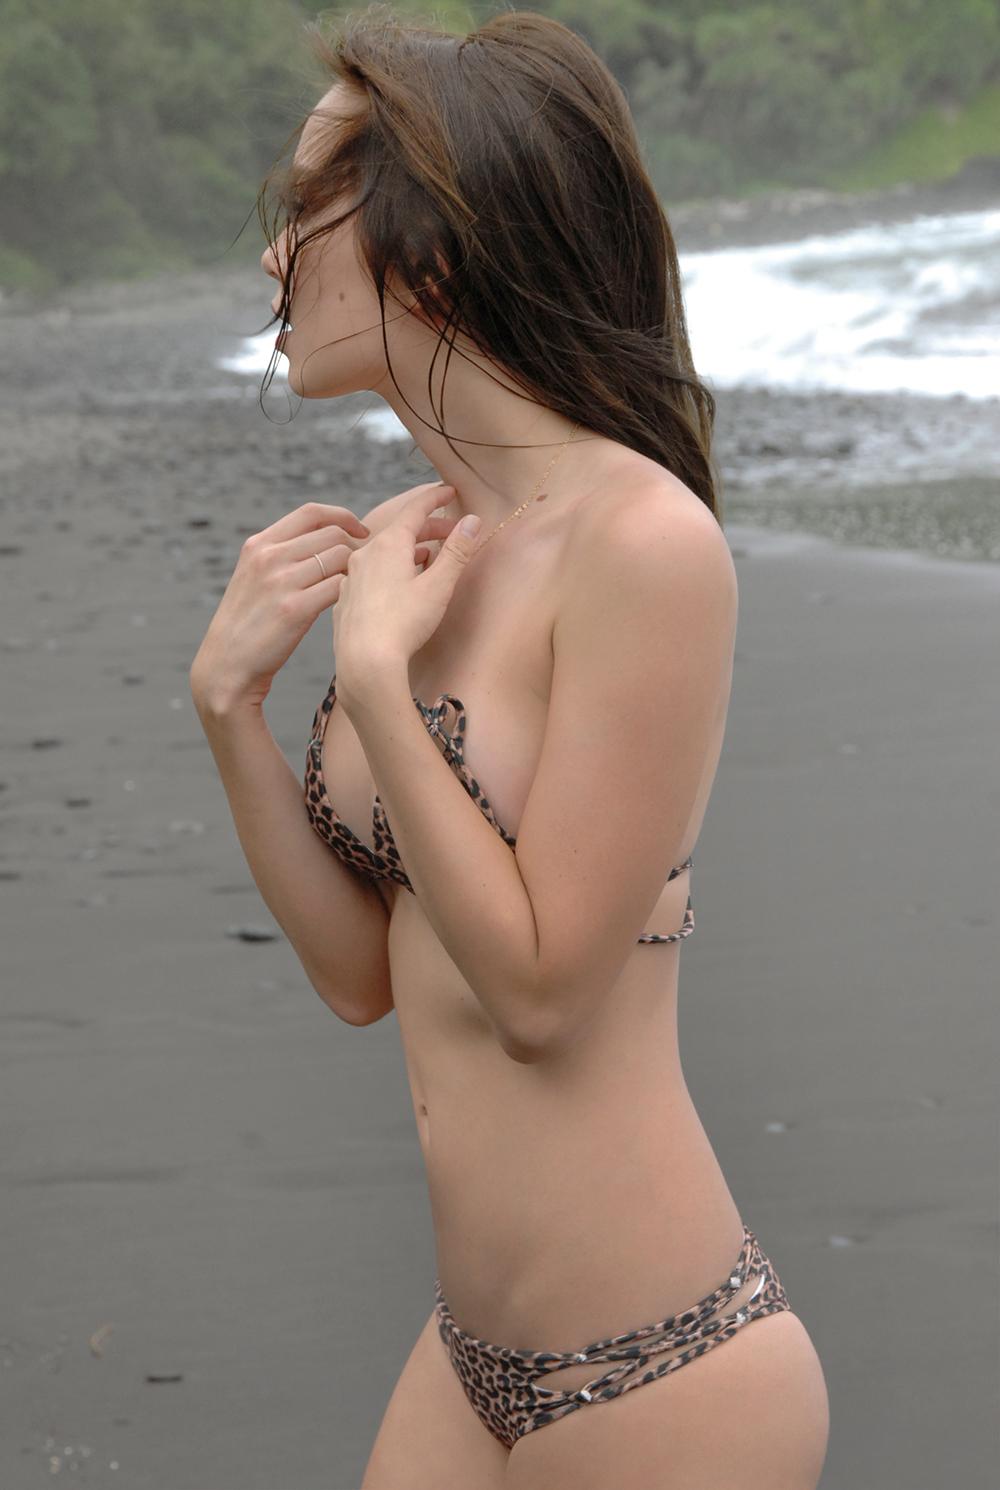 Swimbook_swimsuit_Acacia_Marlie_Hinshaw_DSC_0105.JPG